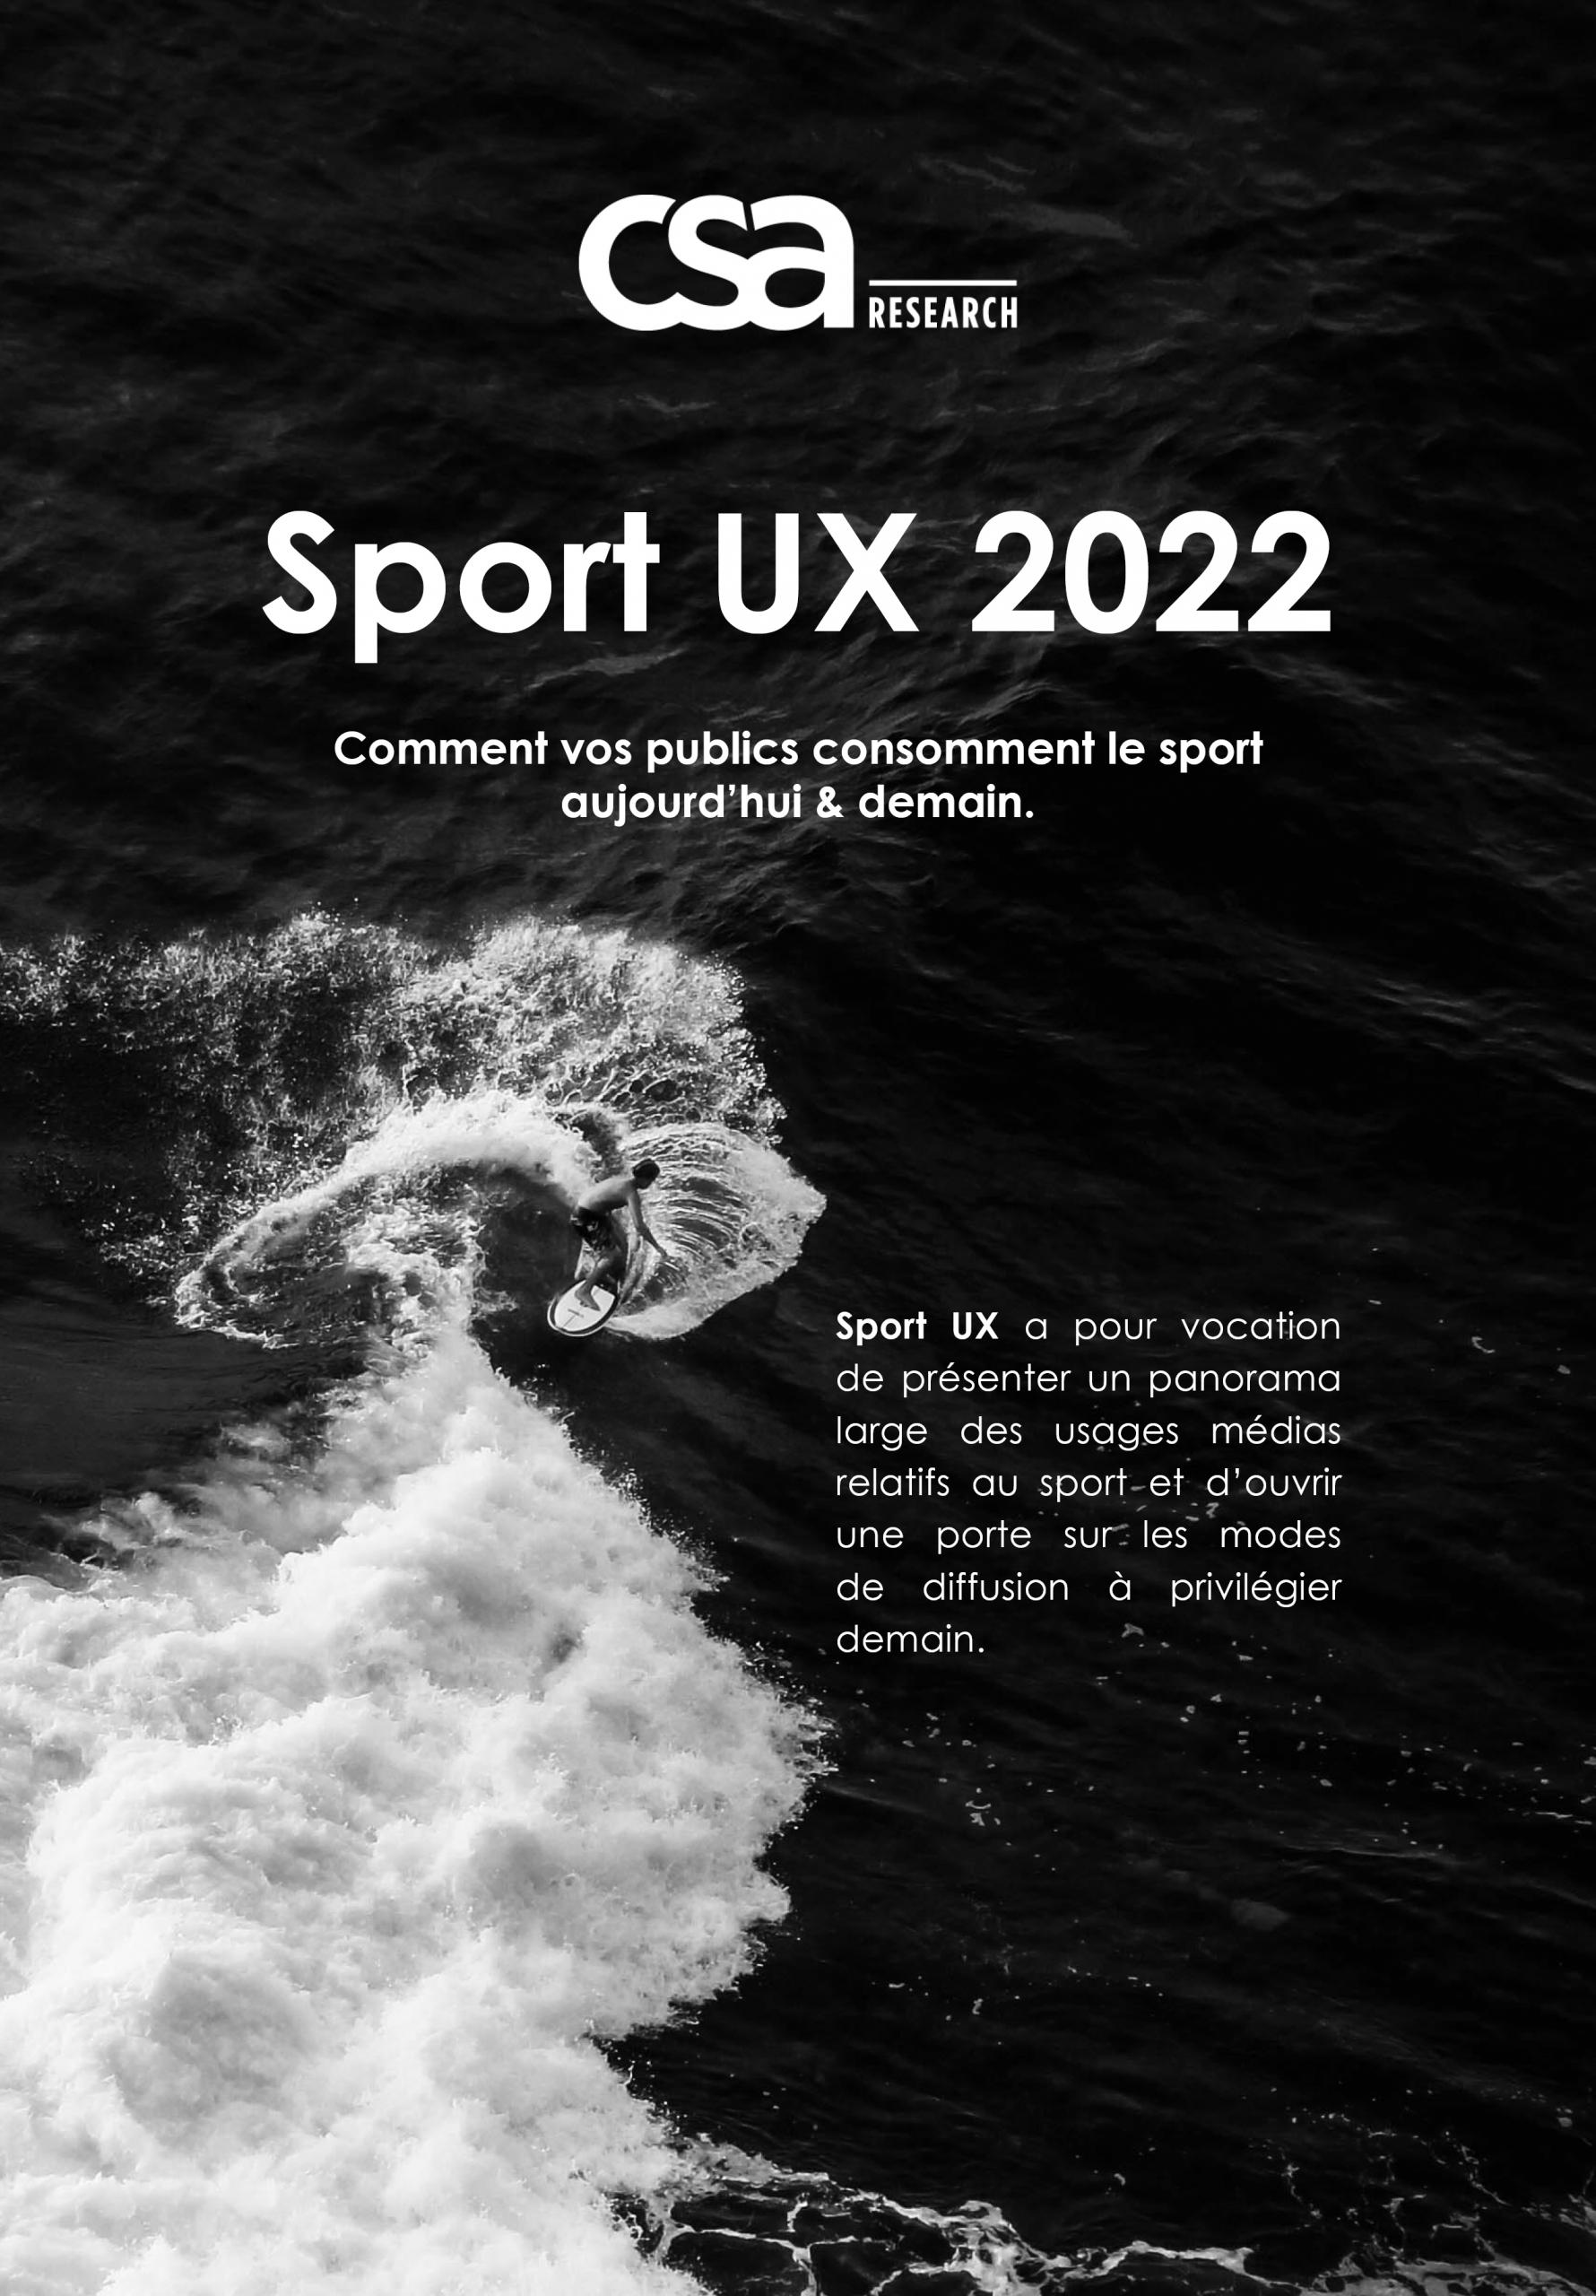 Sport UX 2022